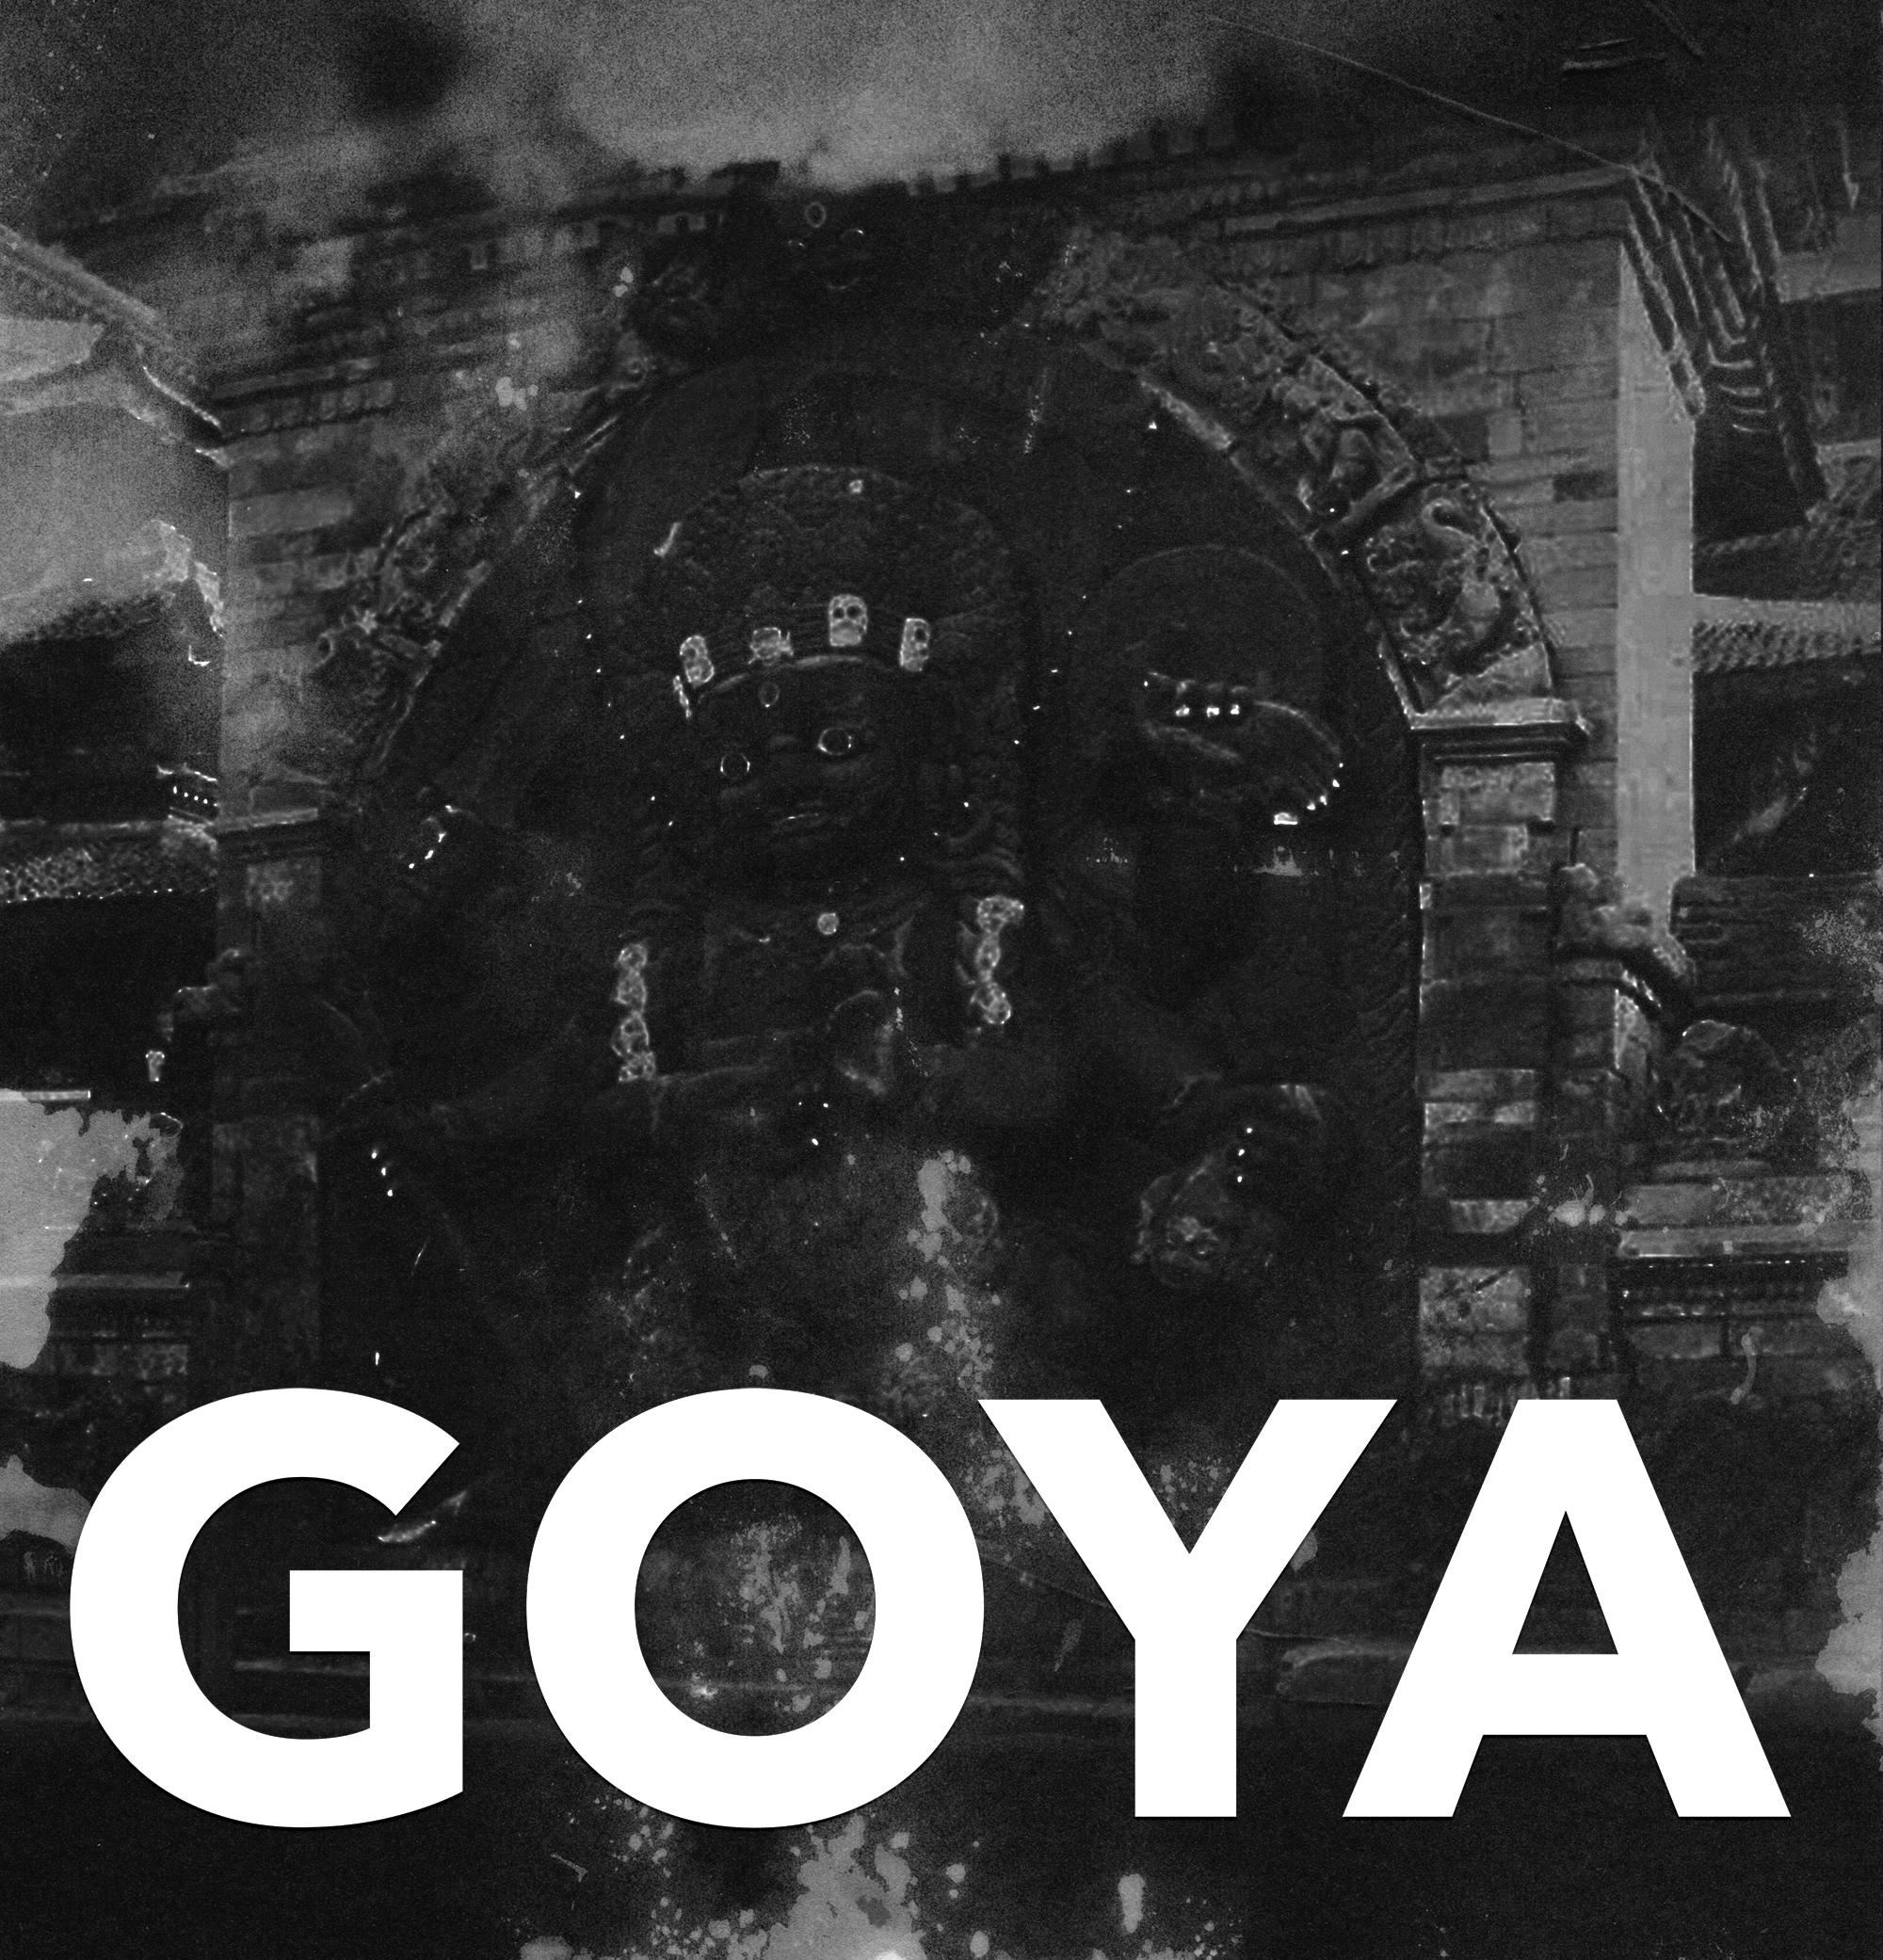 Goya release first performance music video 'Venenatus'